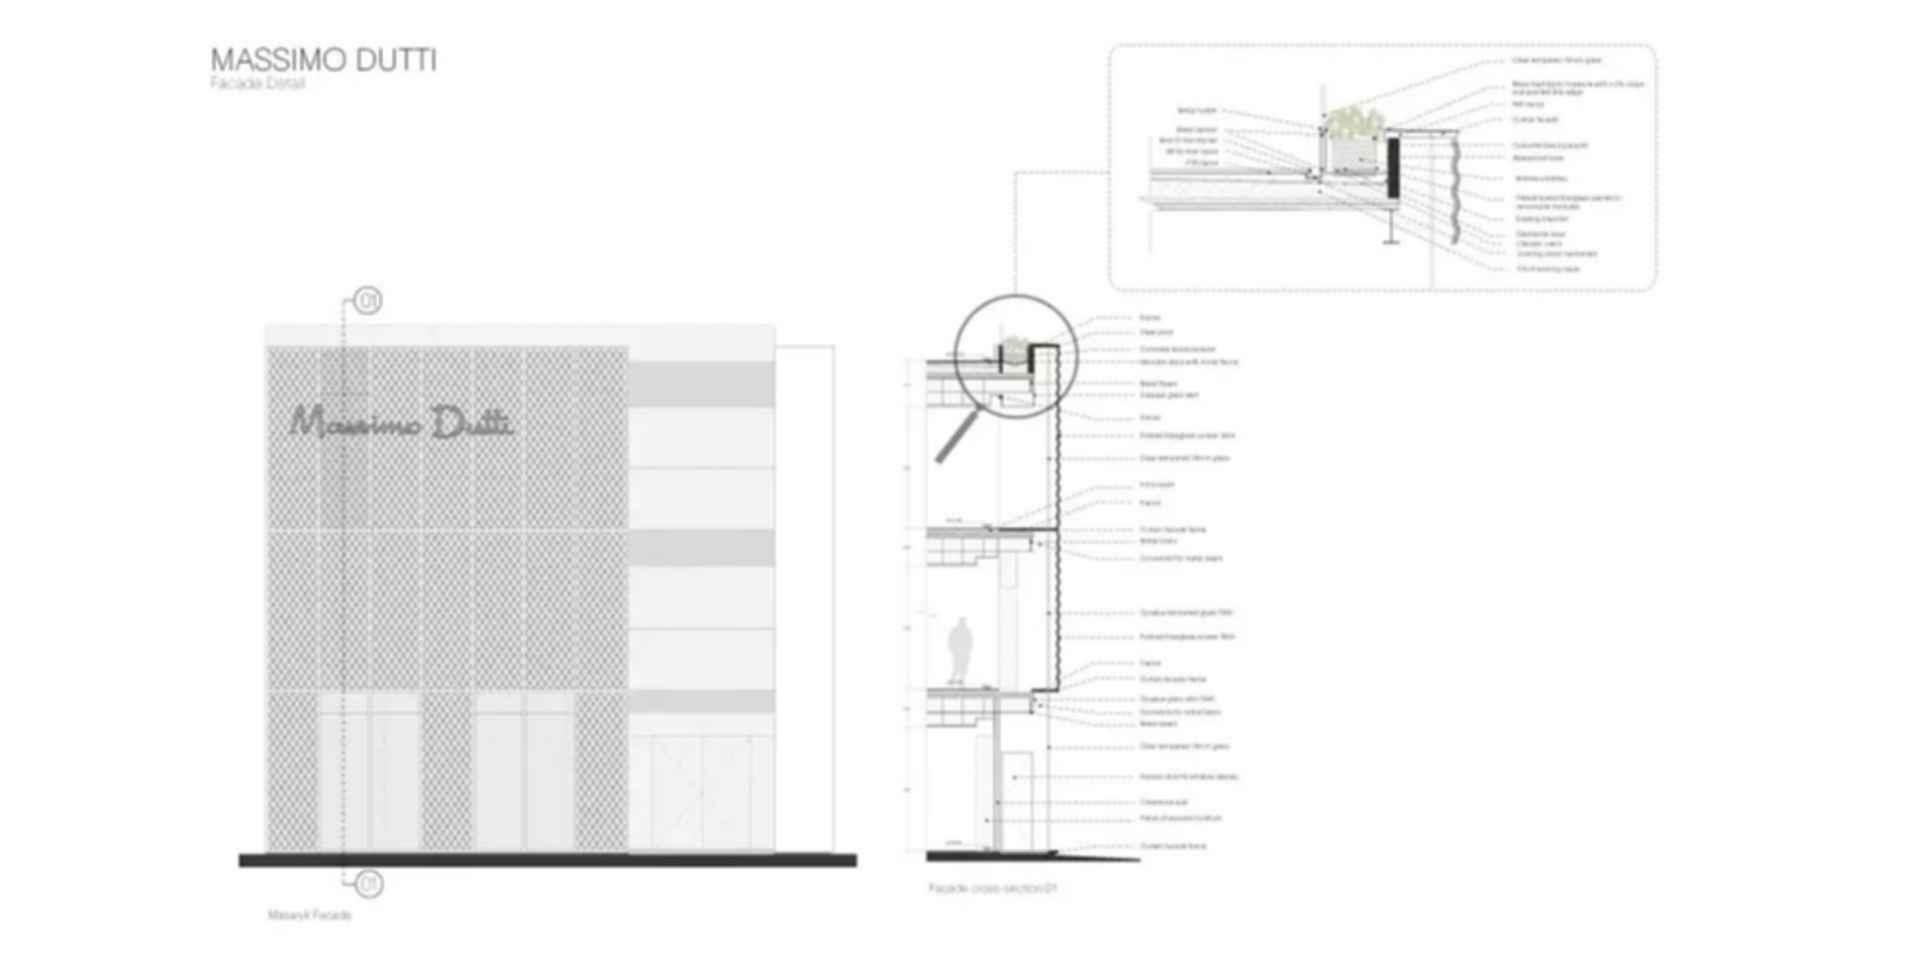 Massimo Dutti - Facade Detail